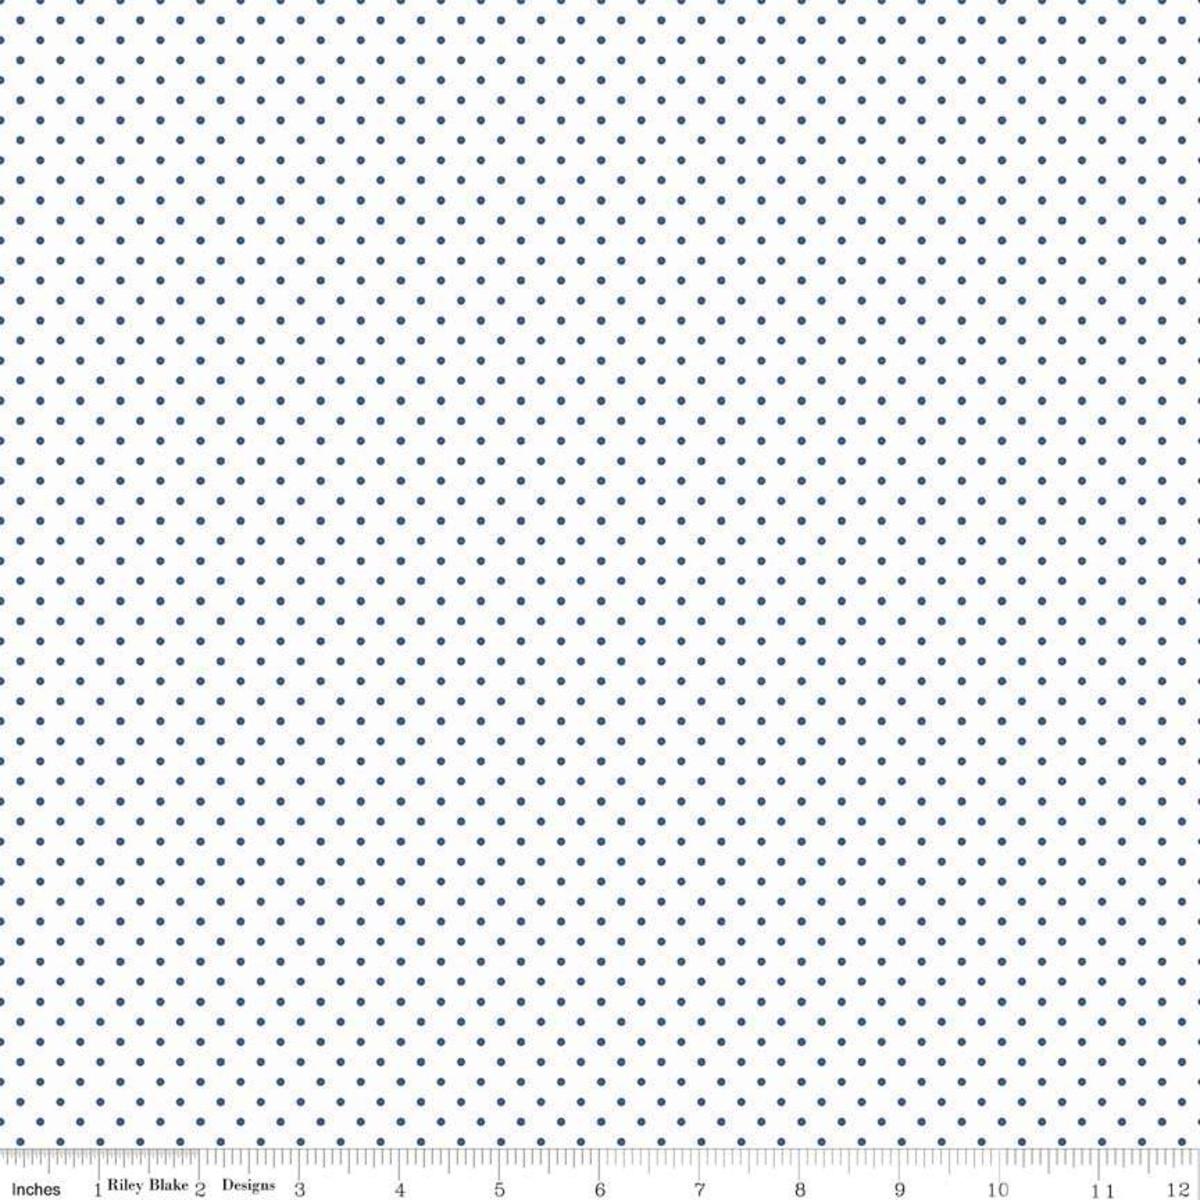 Riley Blake Swiss Dot On White Denim Yardage